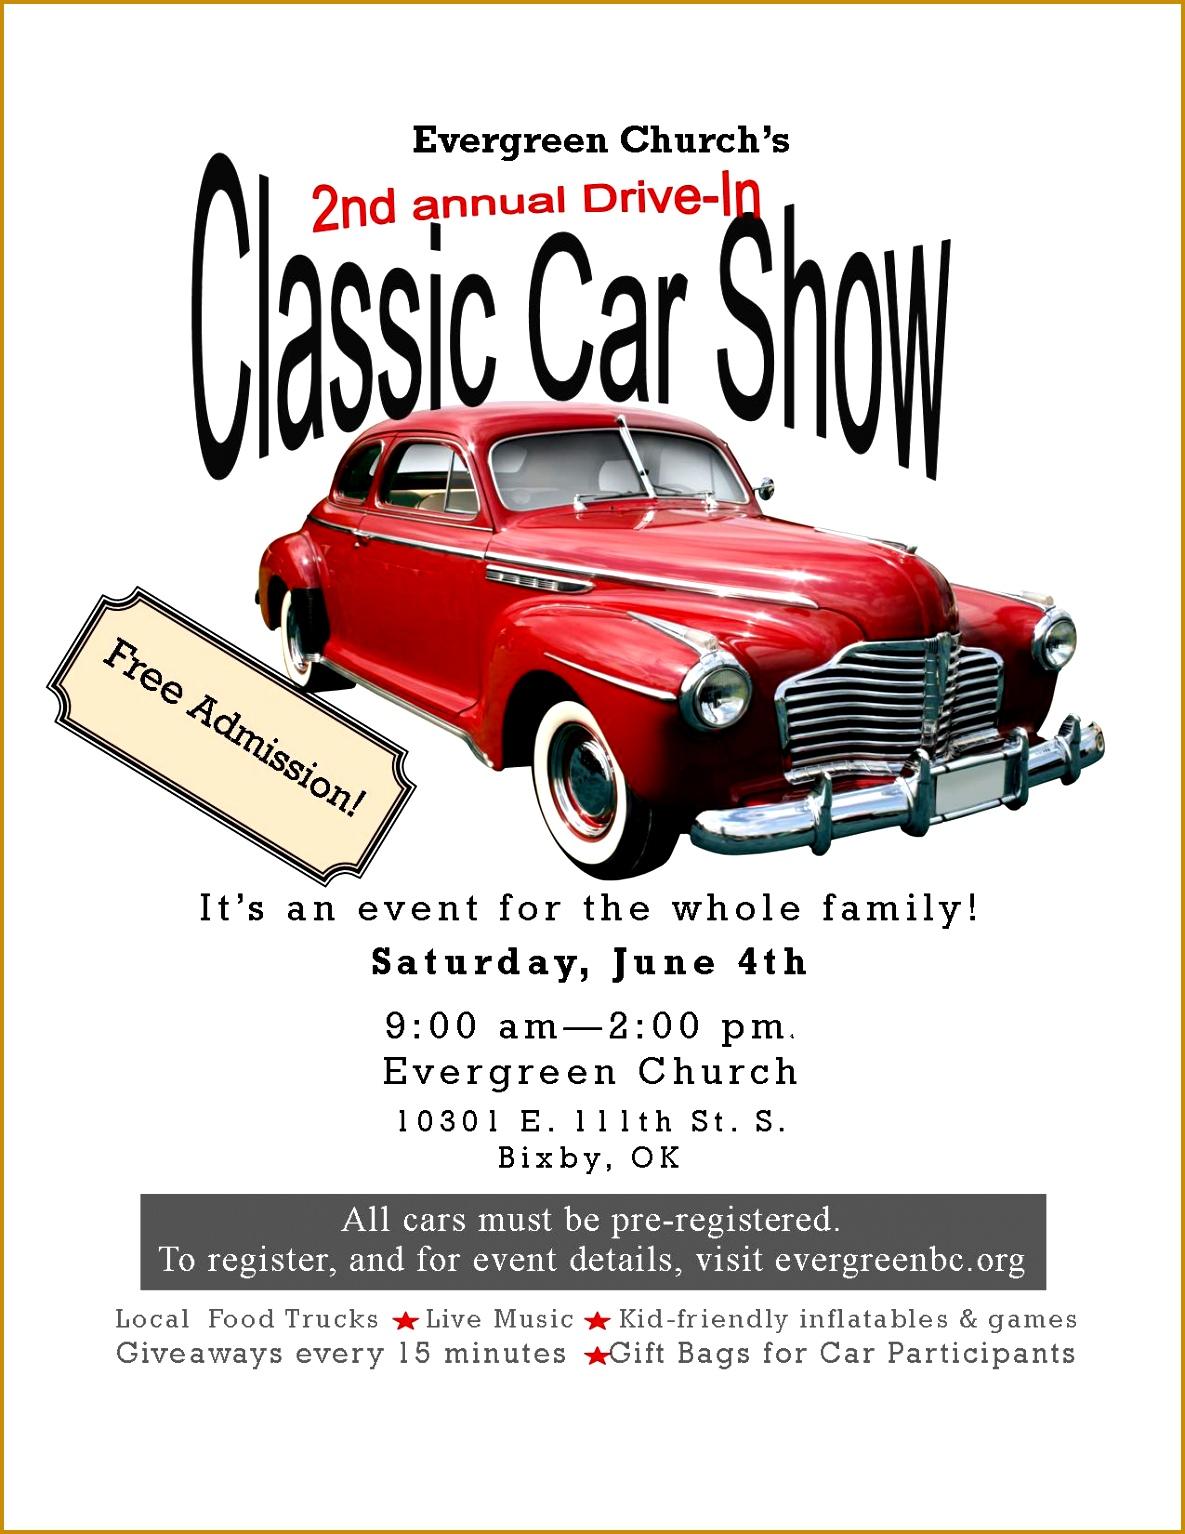 Car Show Flyer Template FabTemplatez - Classic car show poster template